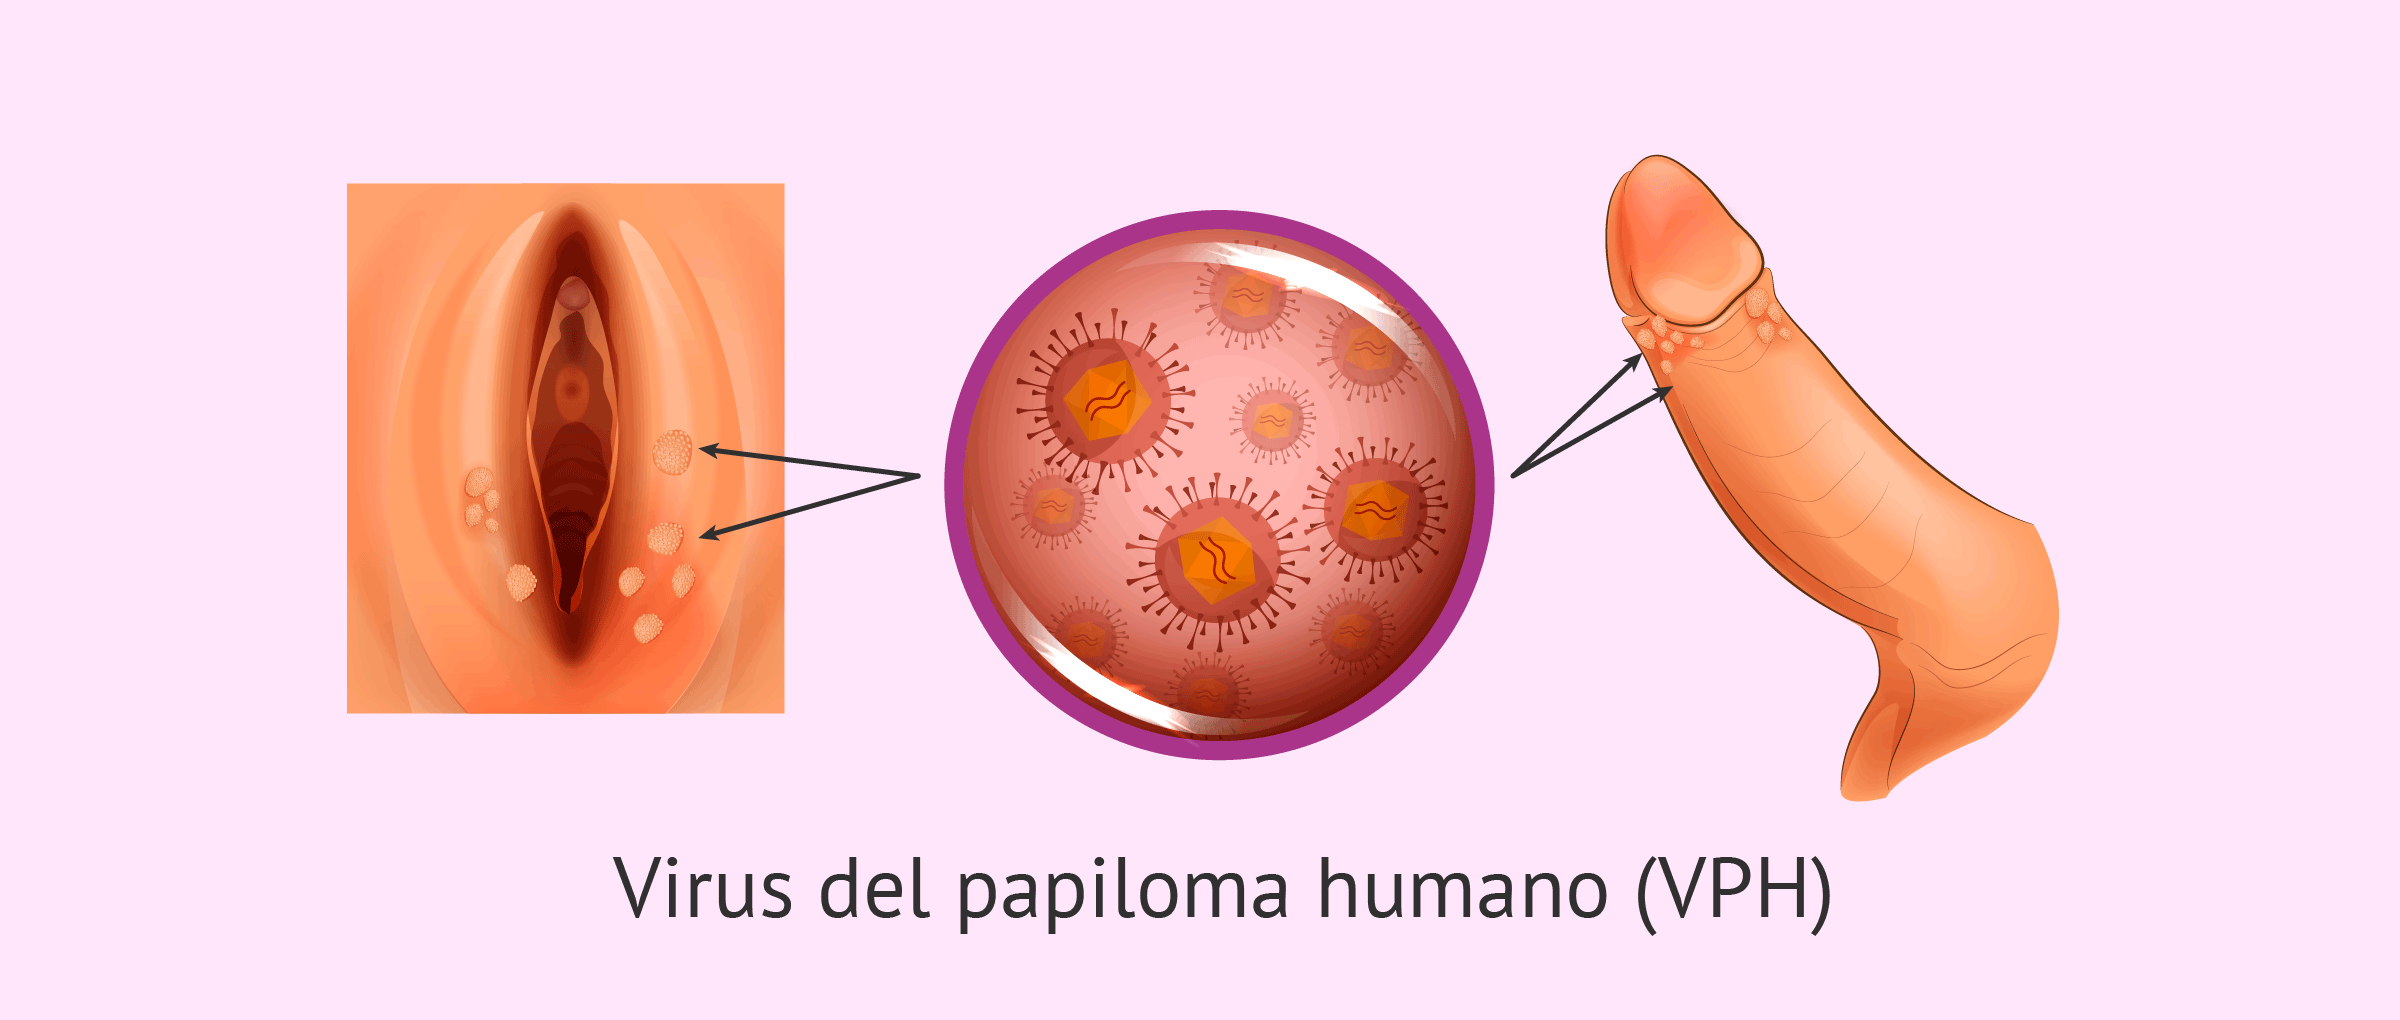 que es l virus del papiloma humano